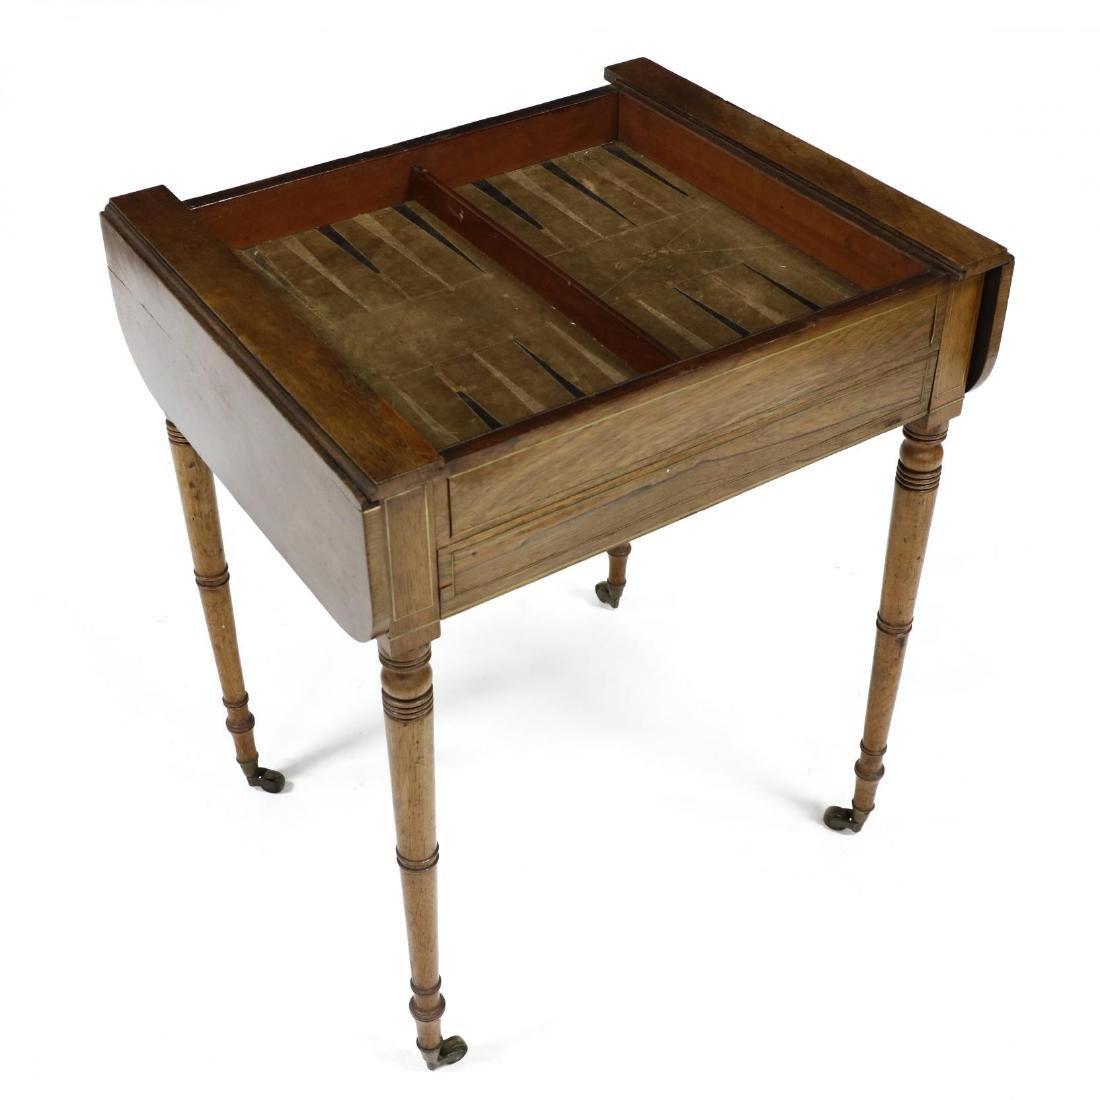 English Regency Game Table - 3